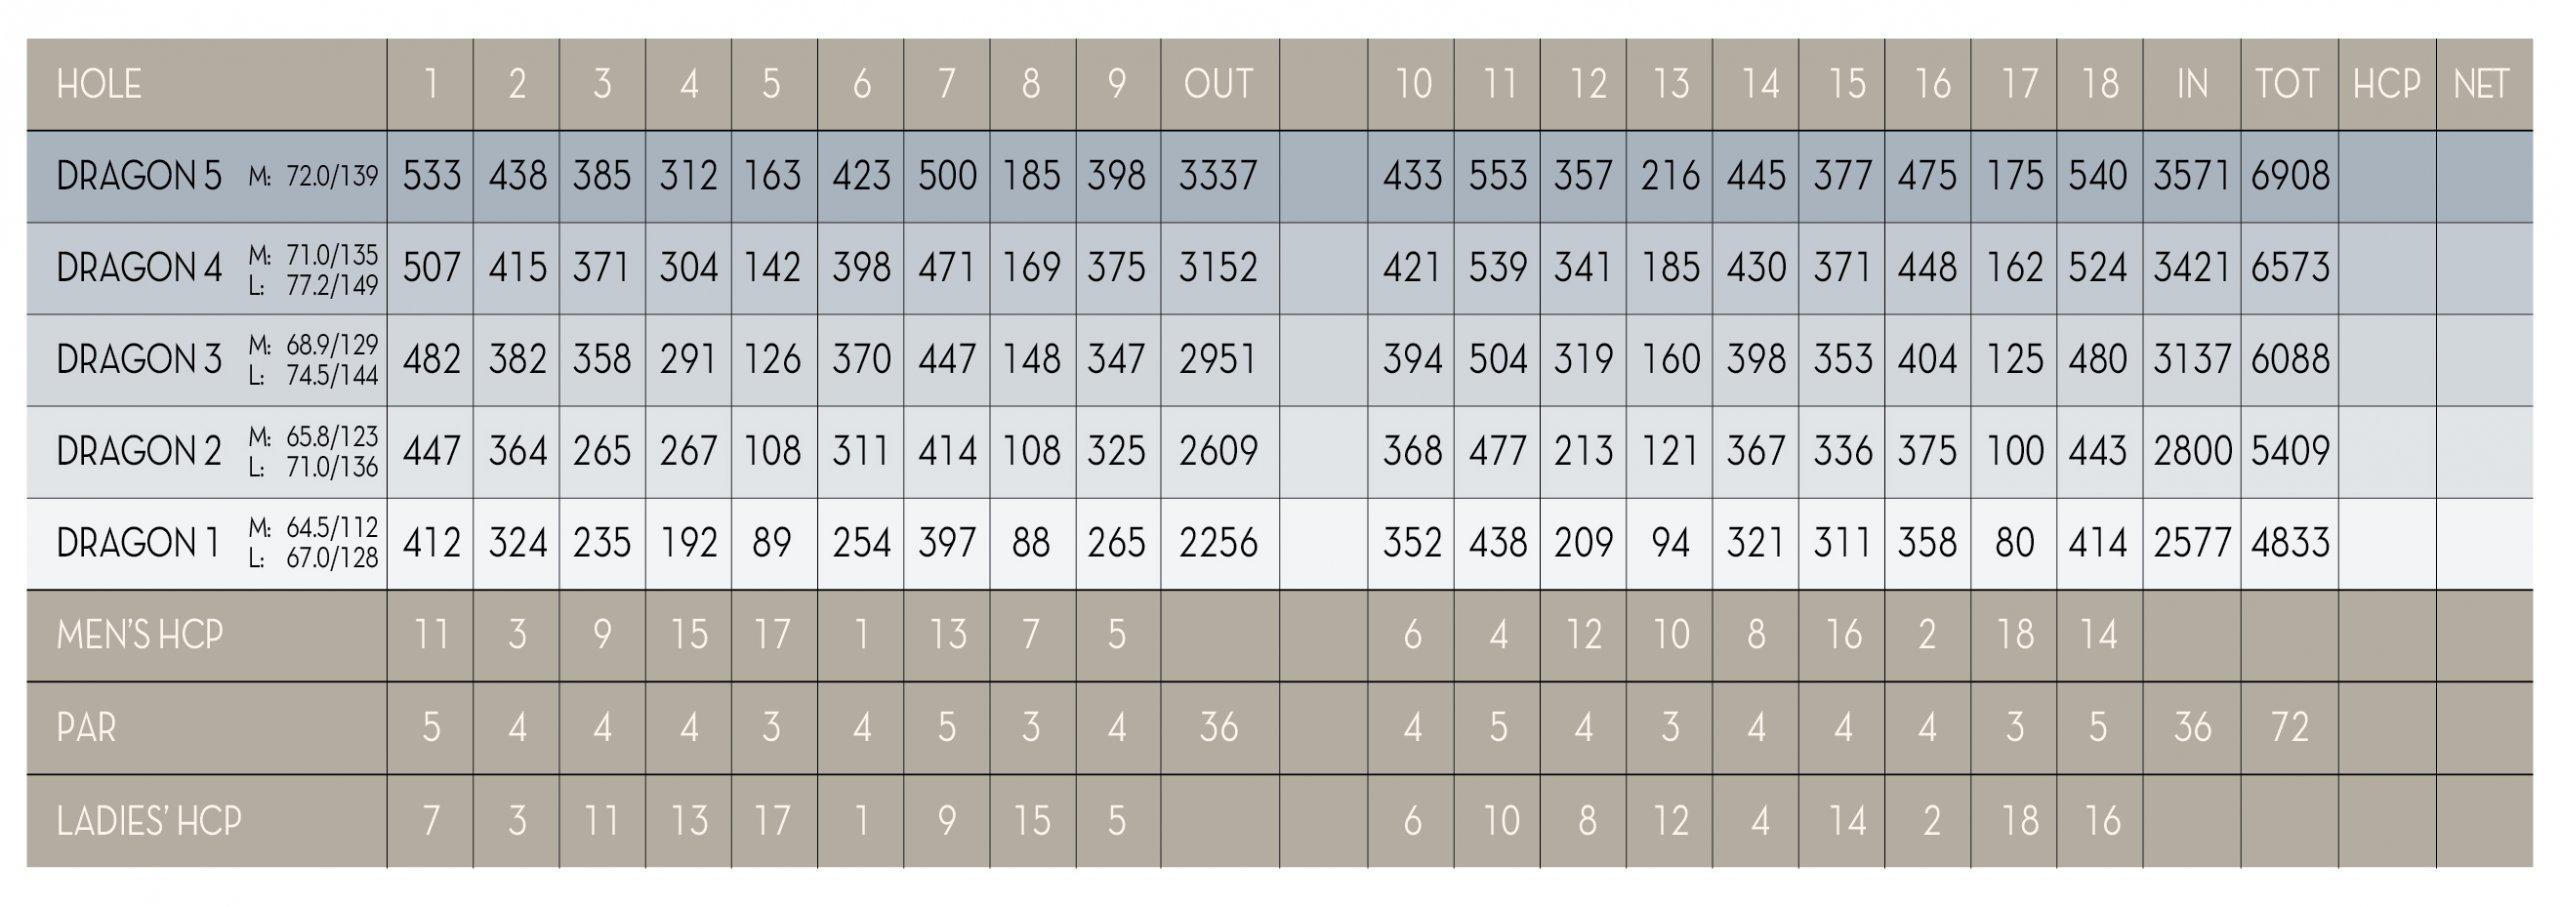 Dragon Scorecard